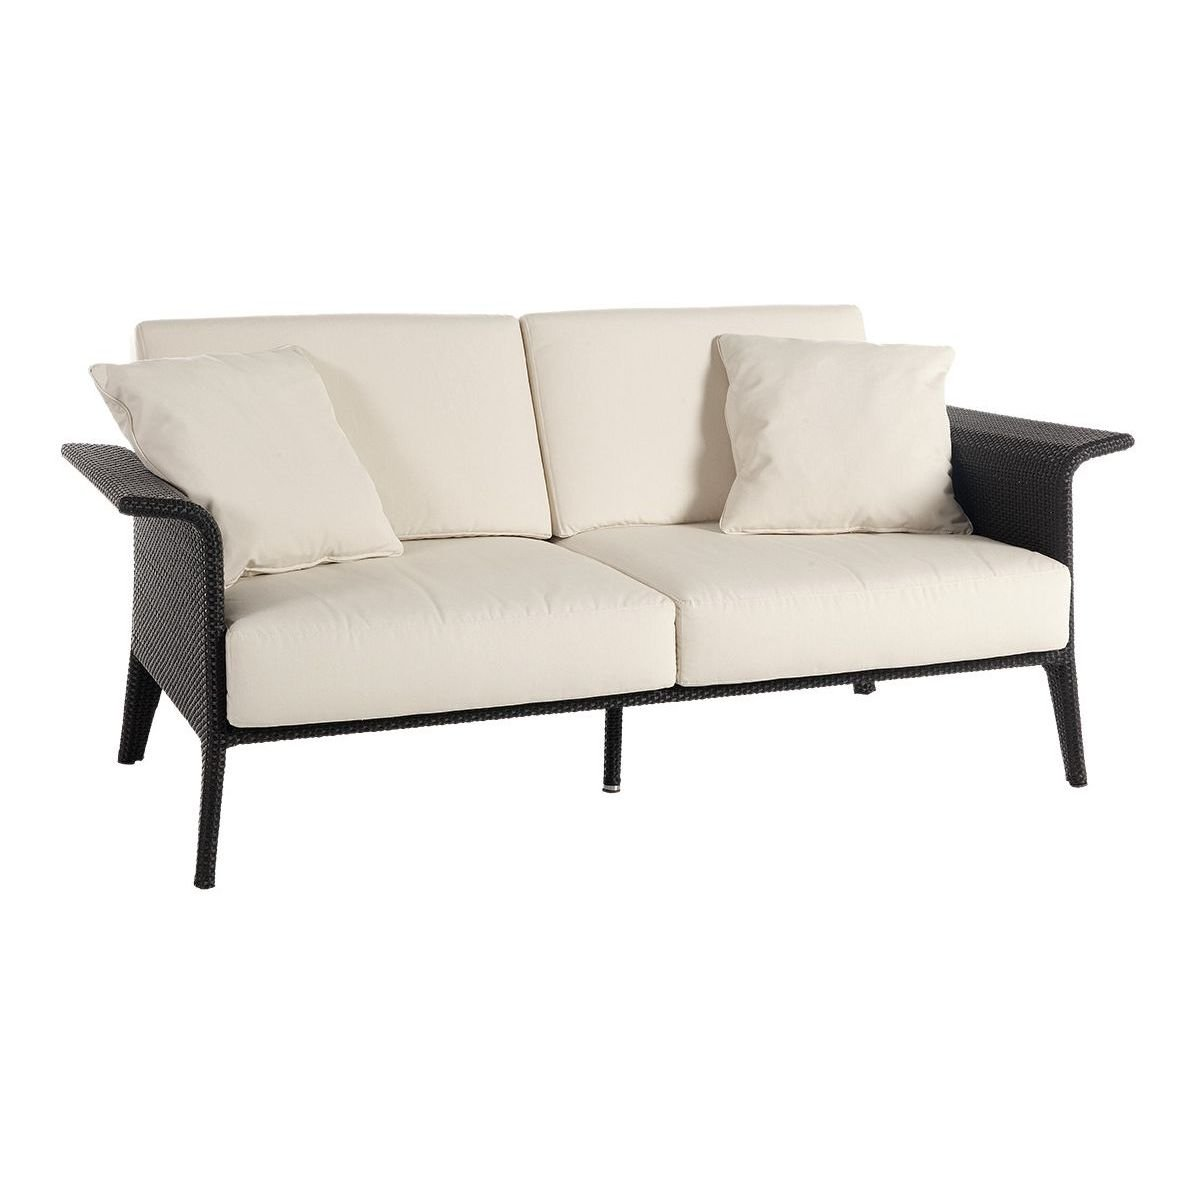 Corte ingles sofas cama great fabulous sof exterior el - Chaise longue el corte ingles ...